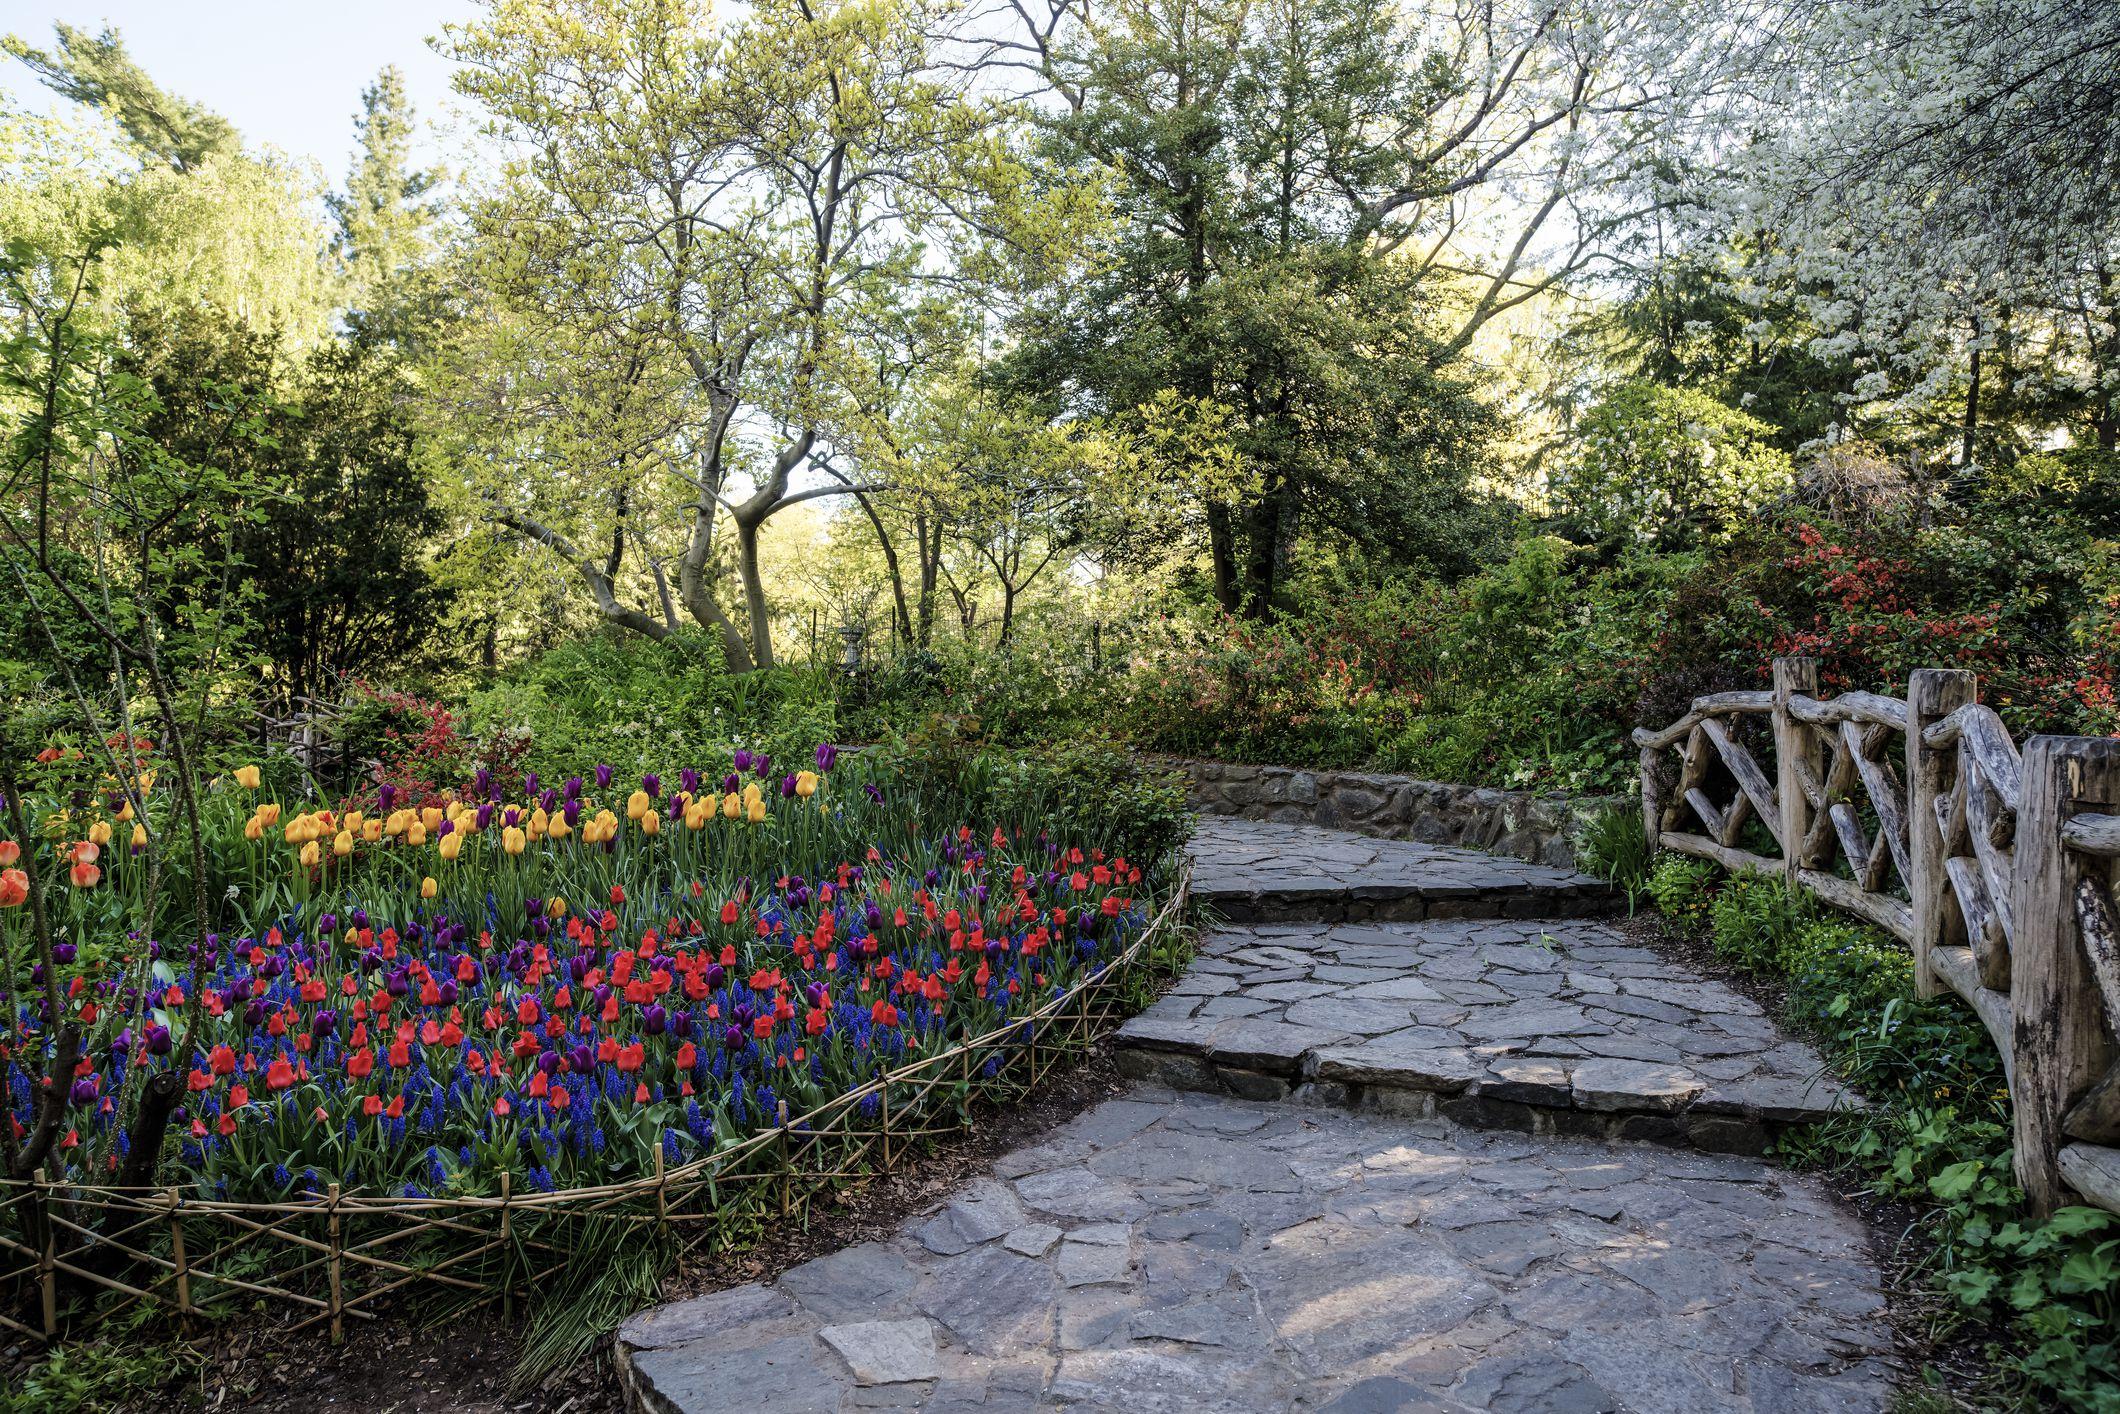 Central Park, New York City Shakespeare Garden